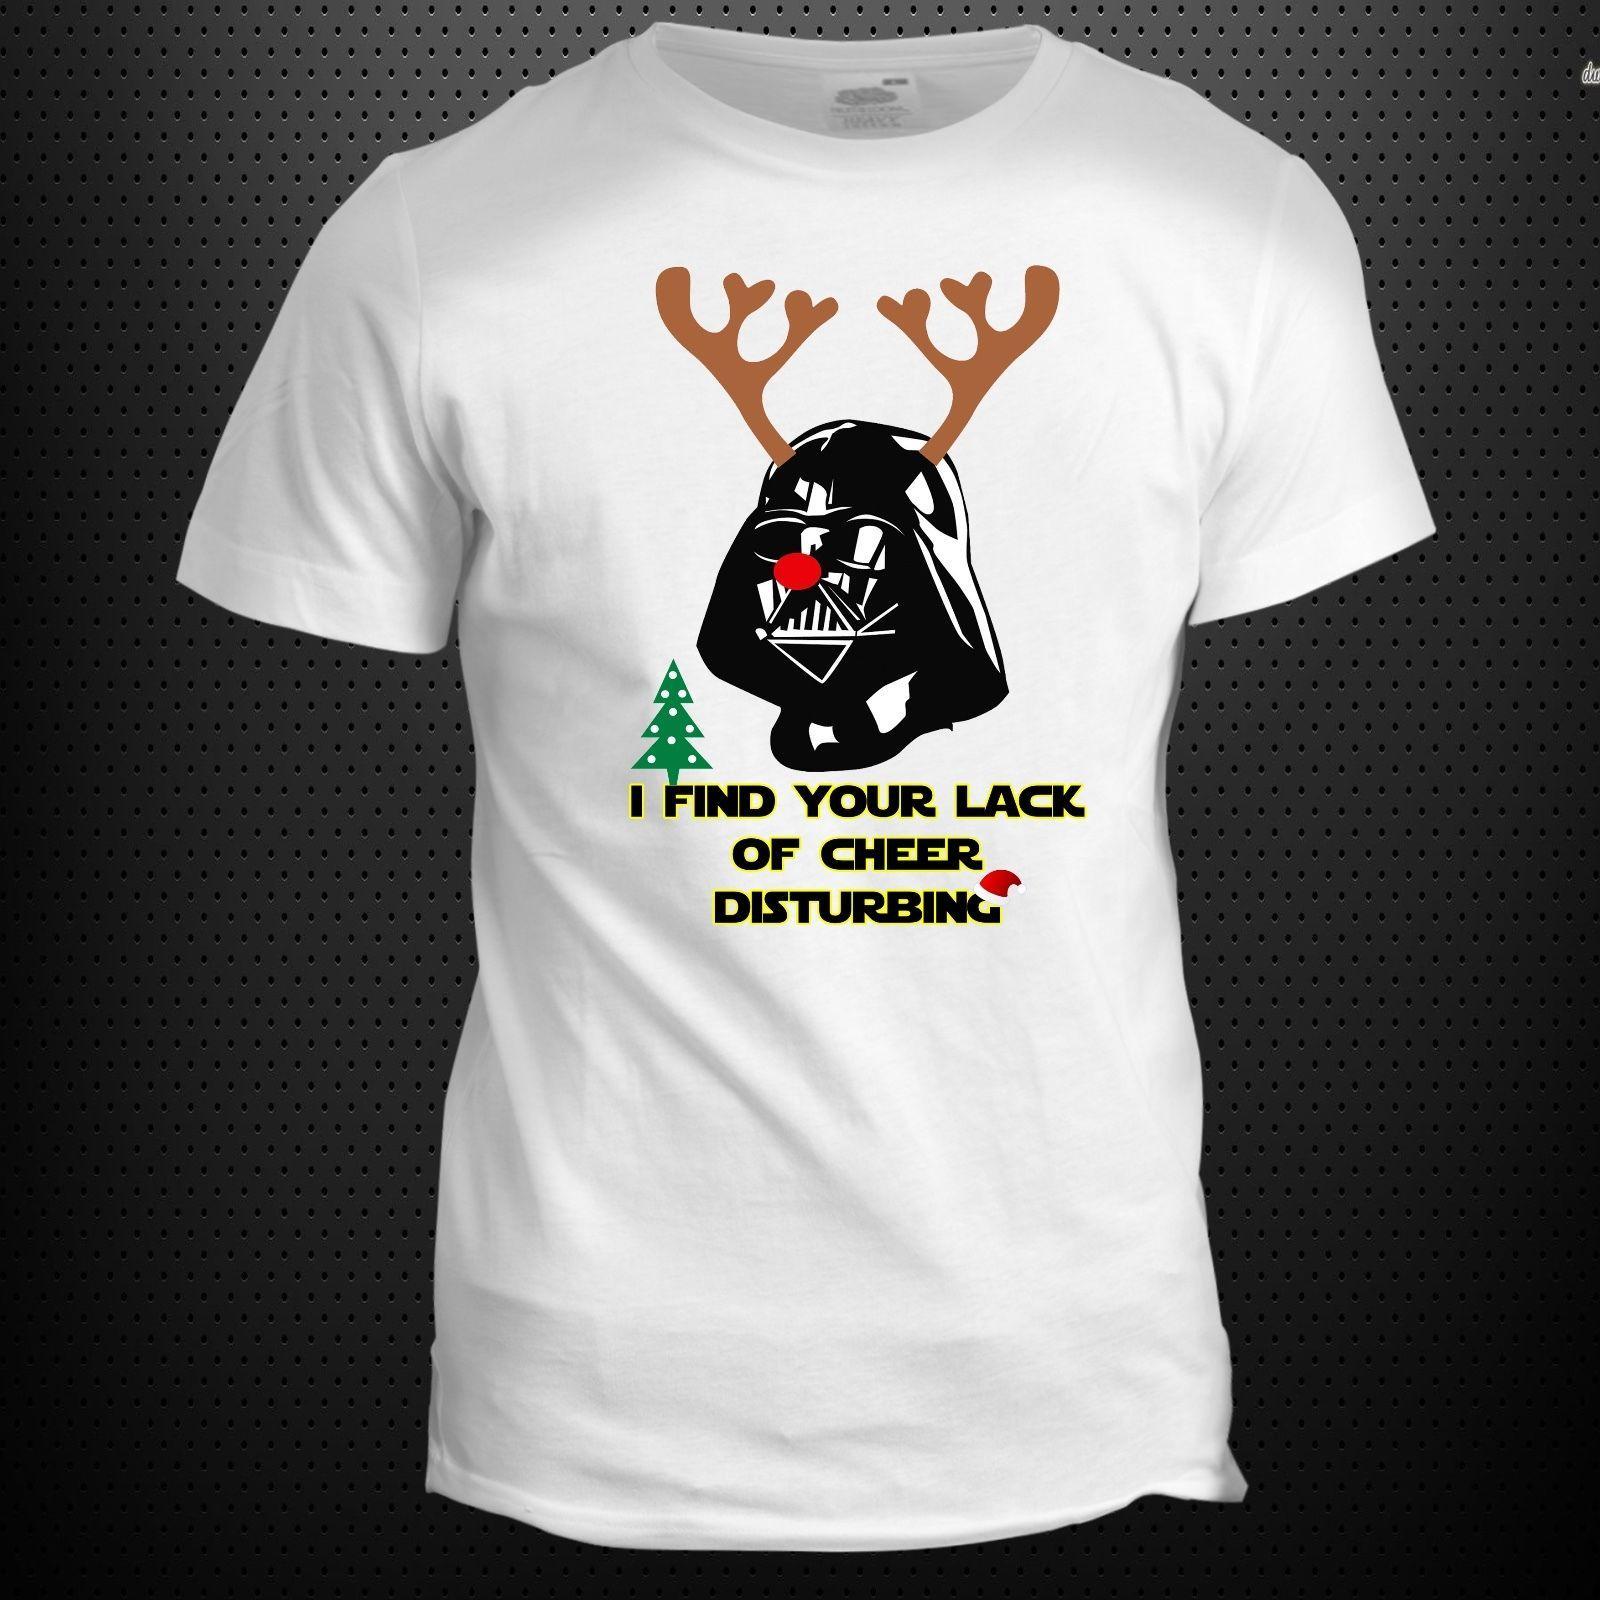 f8937a3c Christmas Xmas Stocking Filler Present Gift Secret Joke Funny Santa T Shirt  T Shirts T Shirts T Tee Shirts From Designtshirt, $11.17| DHgate.Com